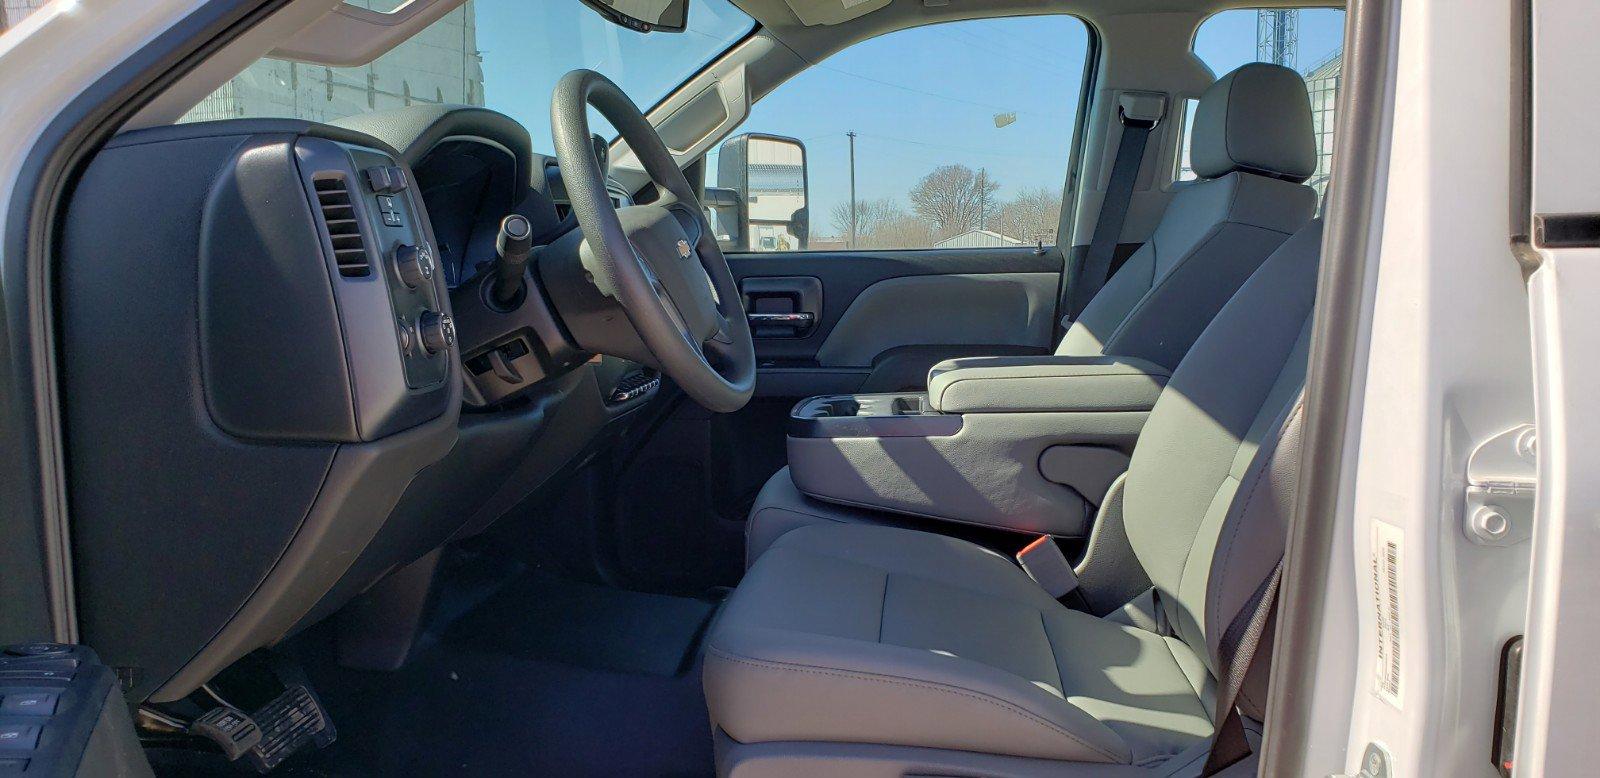 New 2019 Chevrolet Silverado MD Work Truck